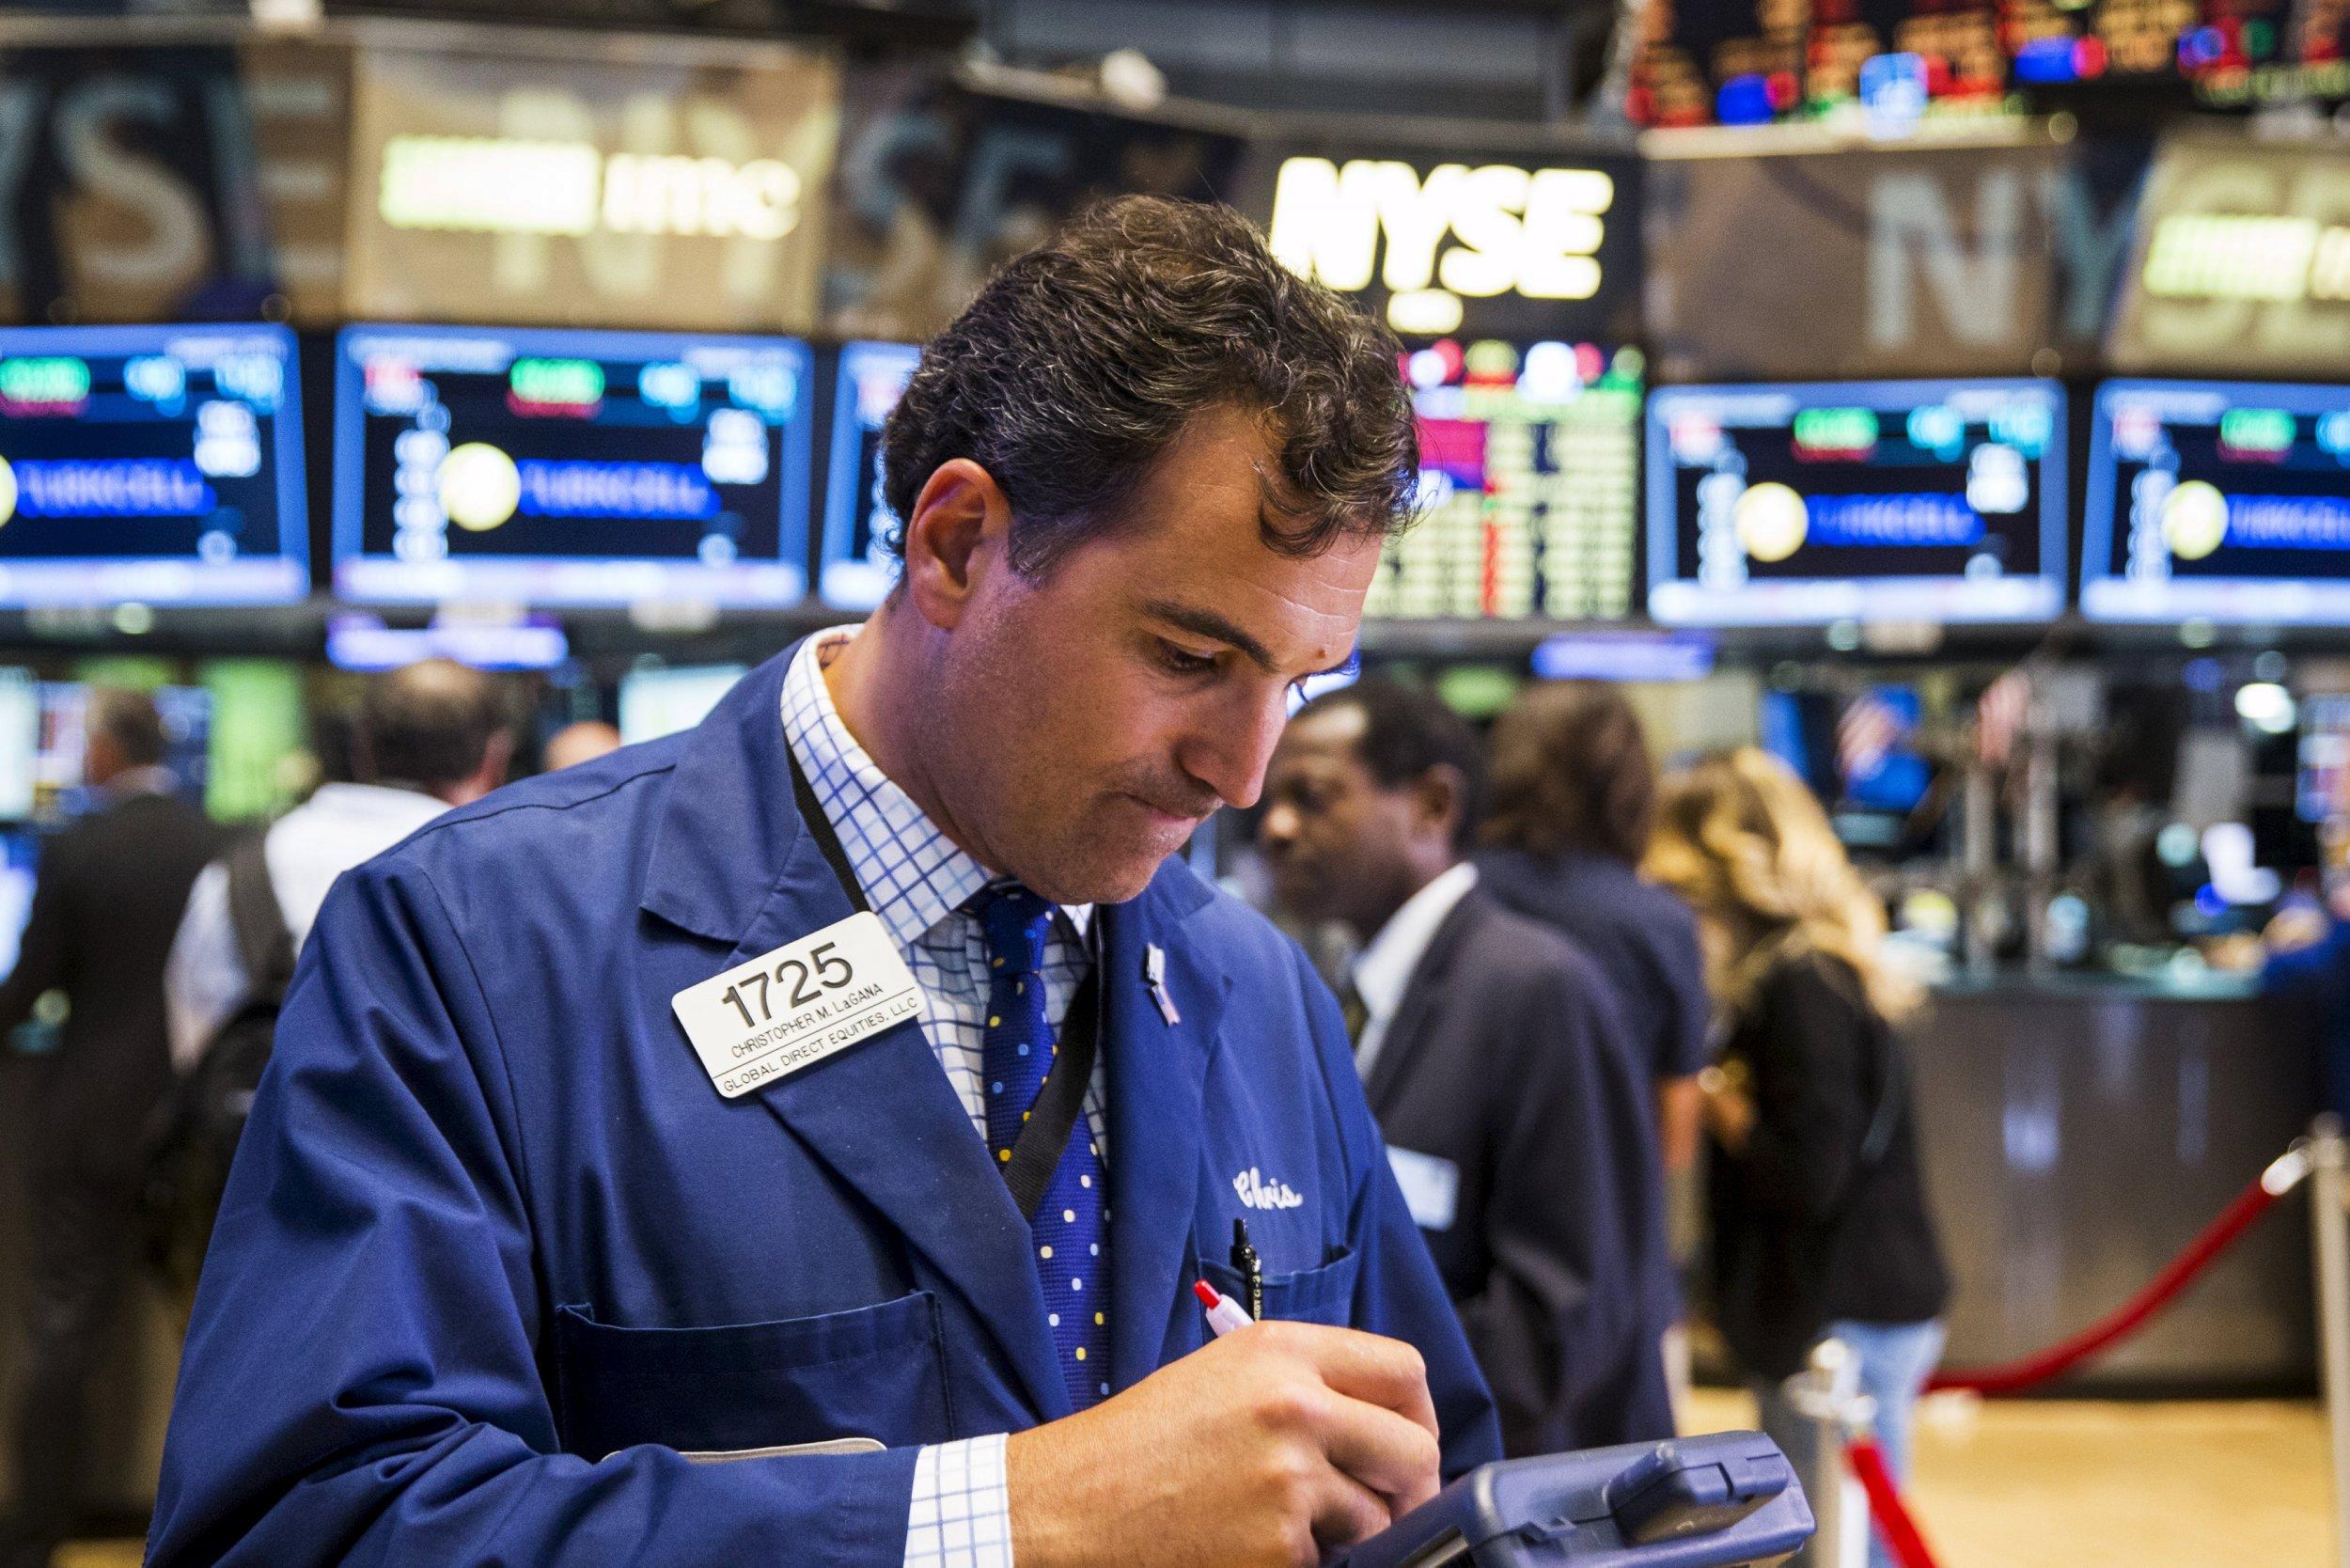 09_01_Stocks_02